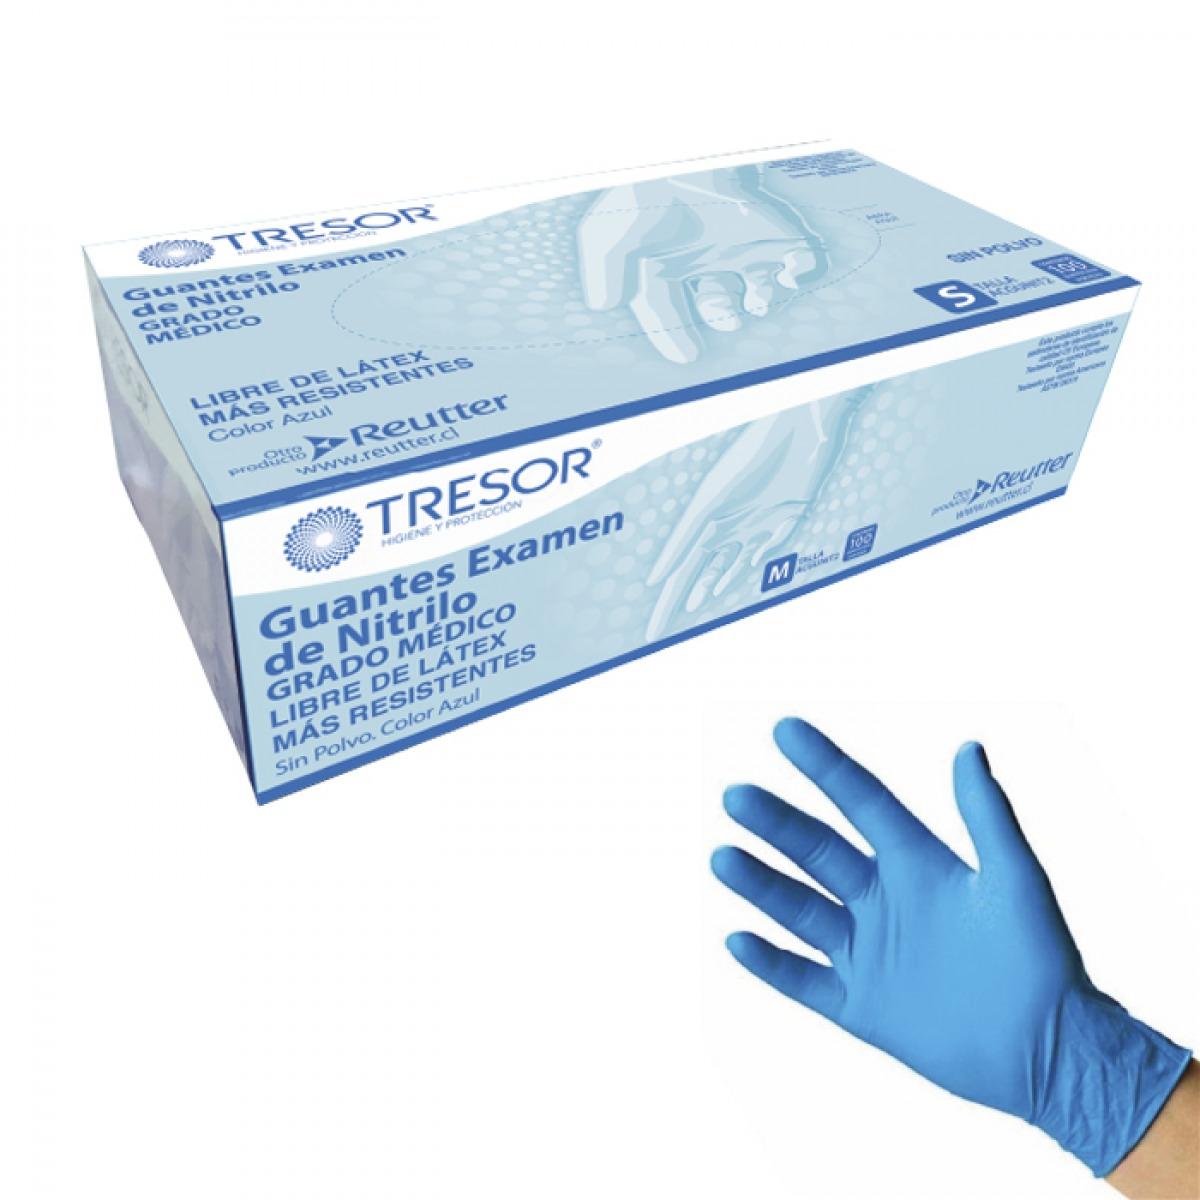 Guante examen nitrilo azul sin polvo